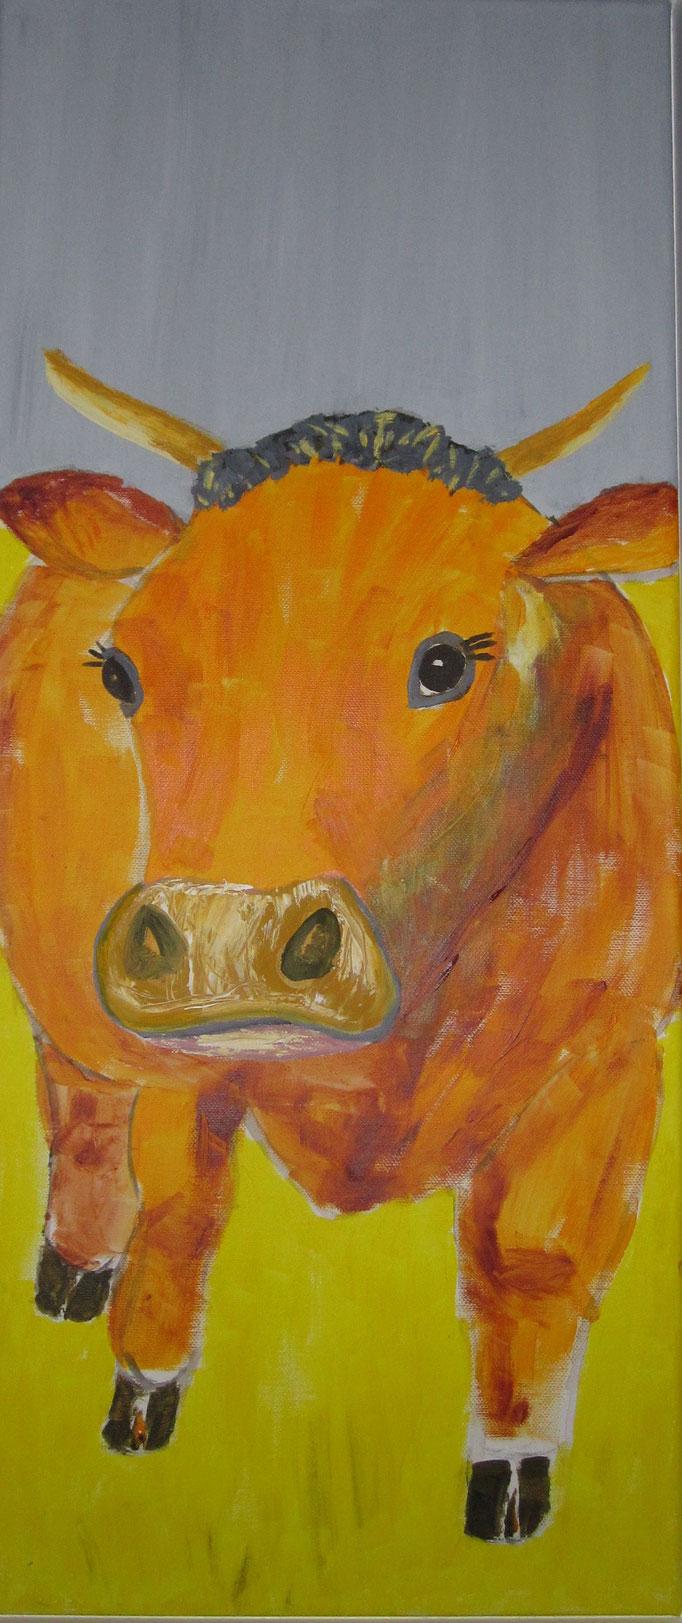 Rotbrauner Stier, 2019, Acryl auf Leinwand, 30 x 70 cm